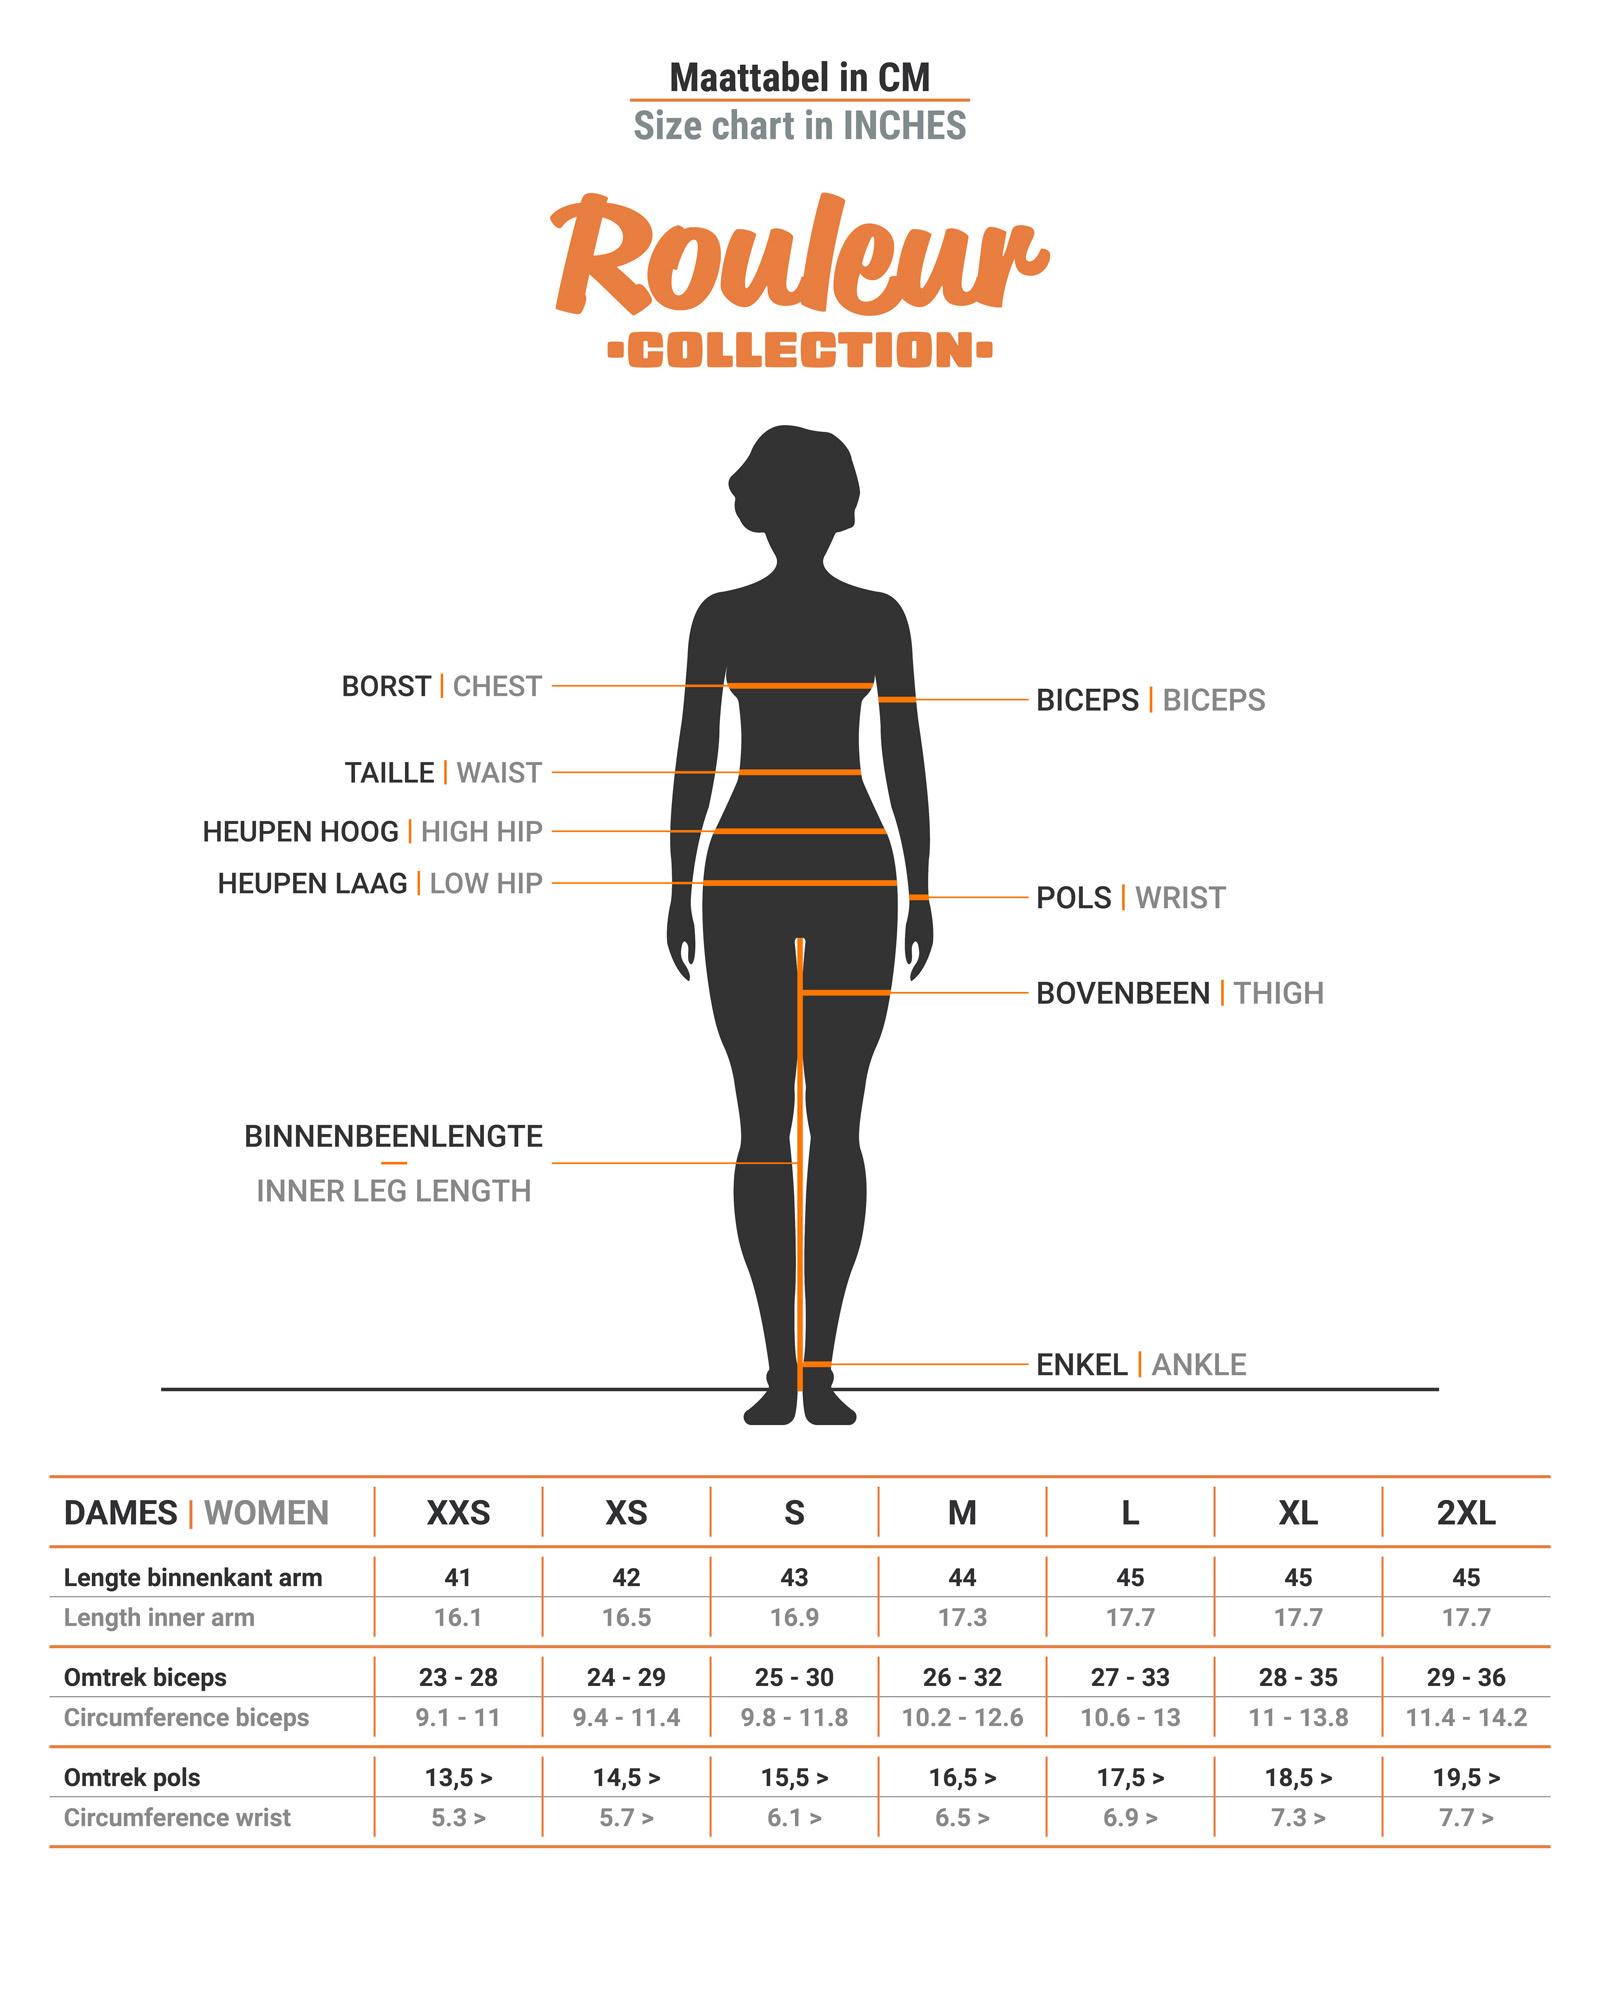 Women's Rouleur Arm Screens | Colombia Coral-3